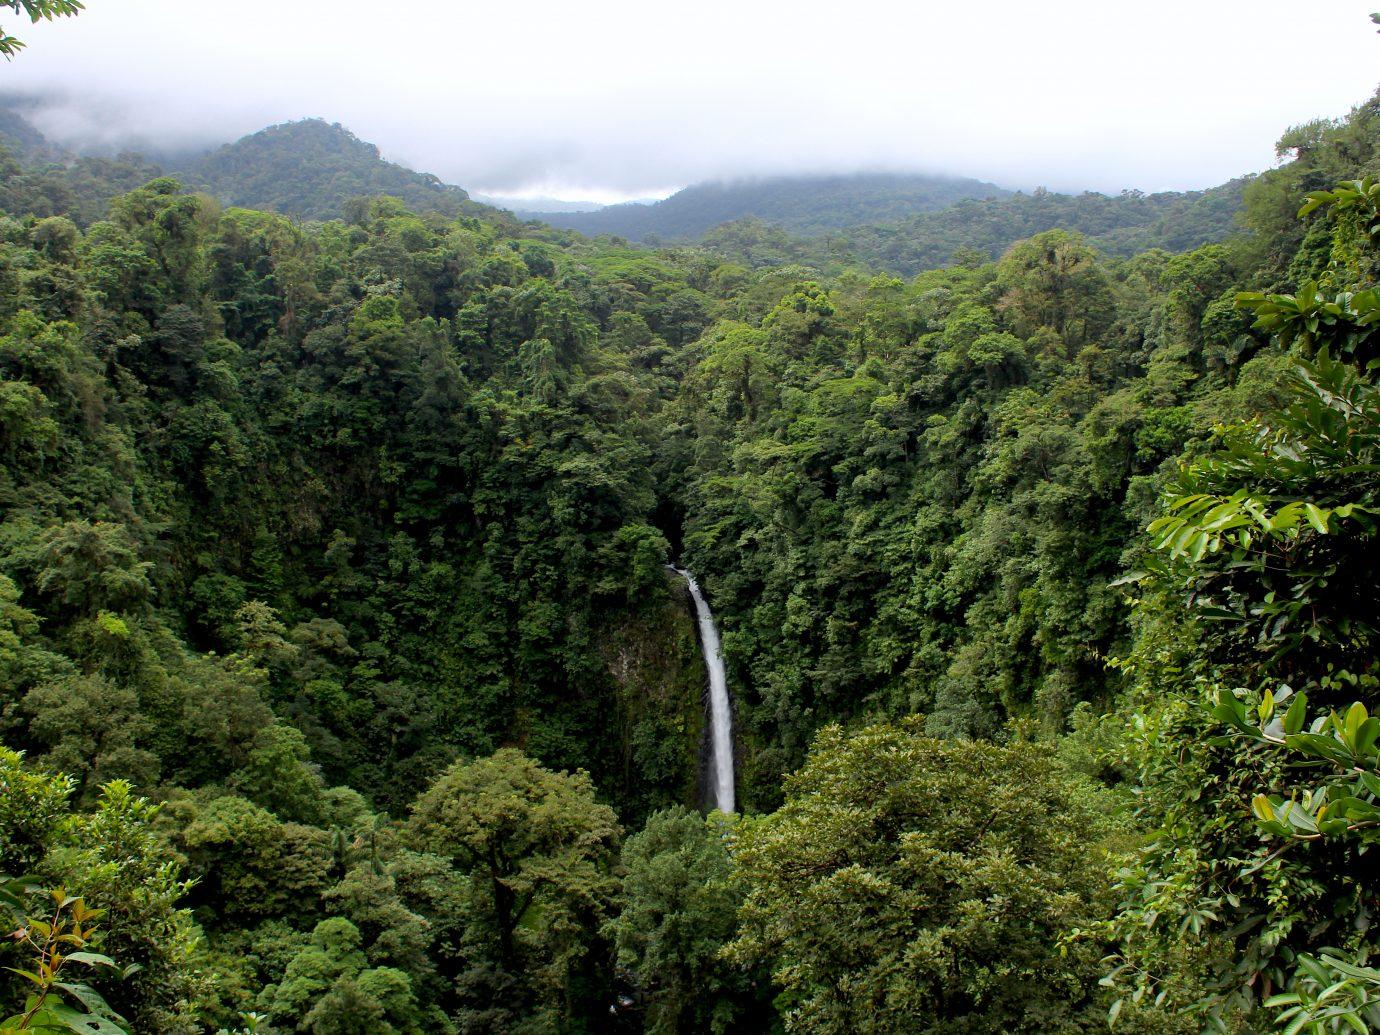 La Fortuna Waterfall in Costa Rica